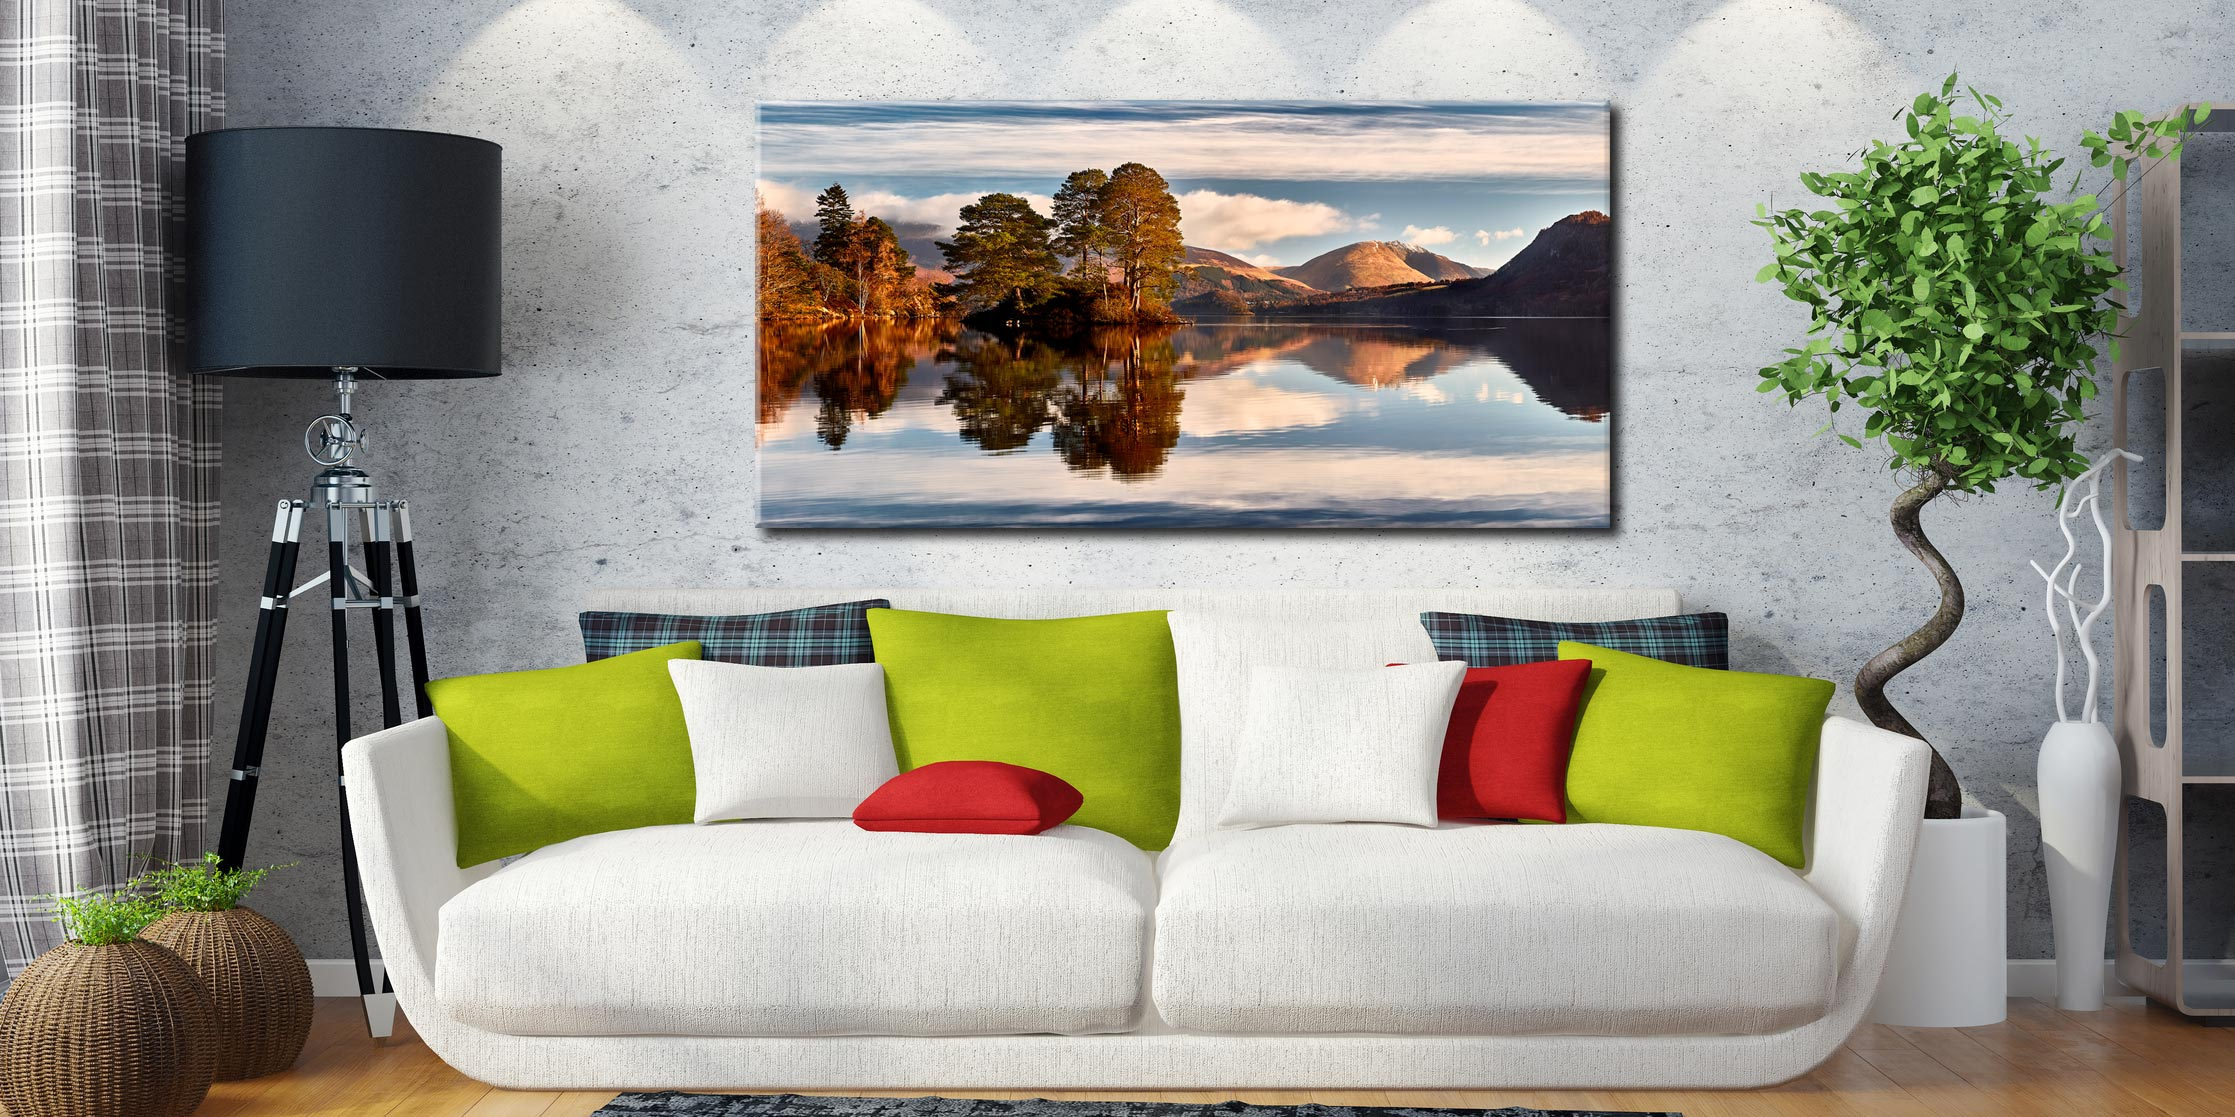 Otter Island in Derwent Water - Canvas Print on Wall